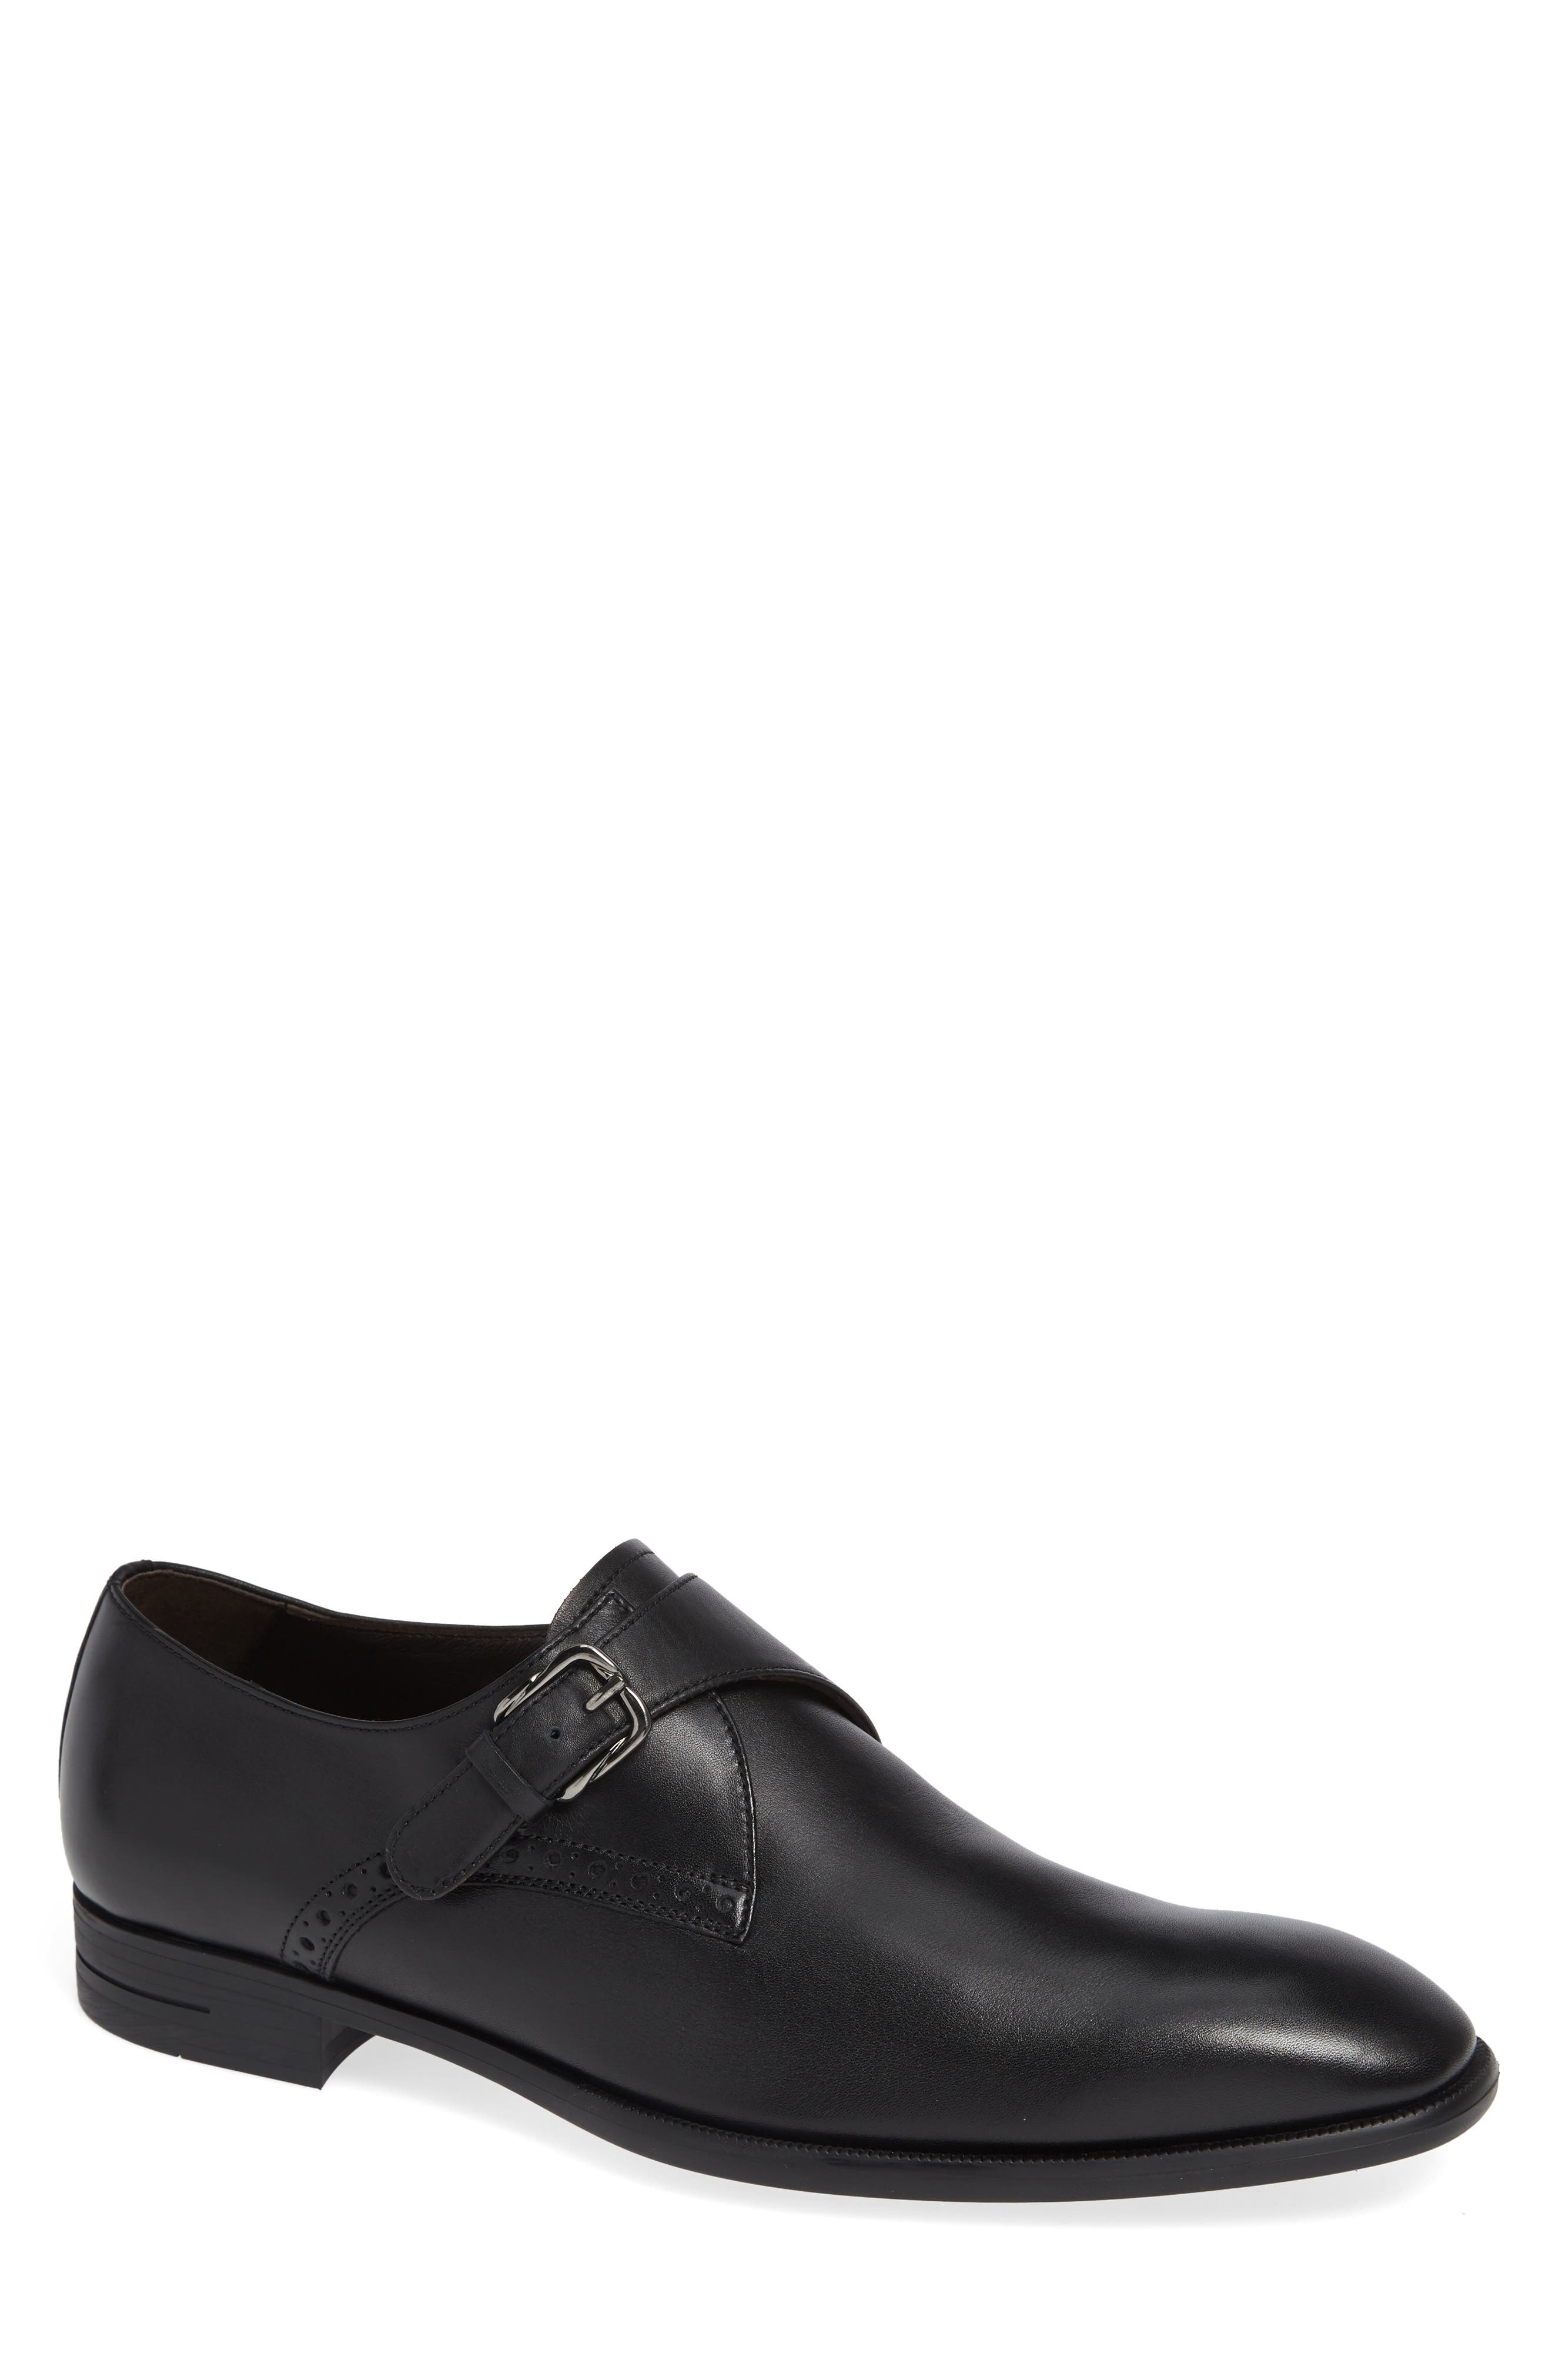 ERMENEGILDO ZEGNA Single Strap Monk Shoe, Main, color, BLACK